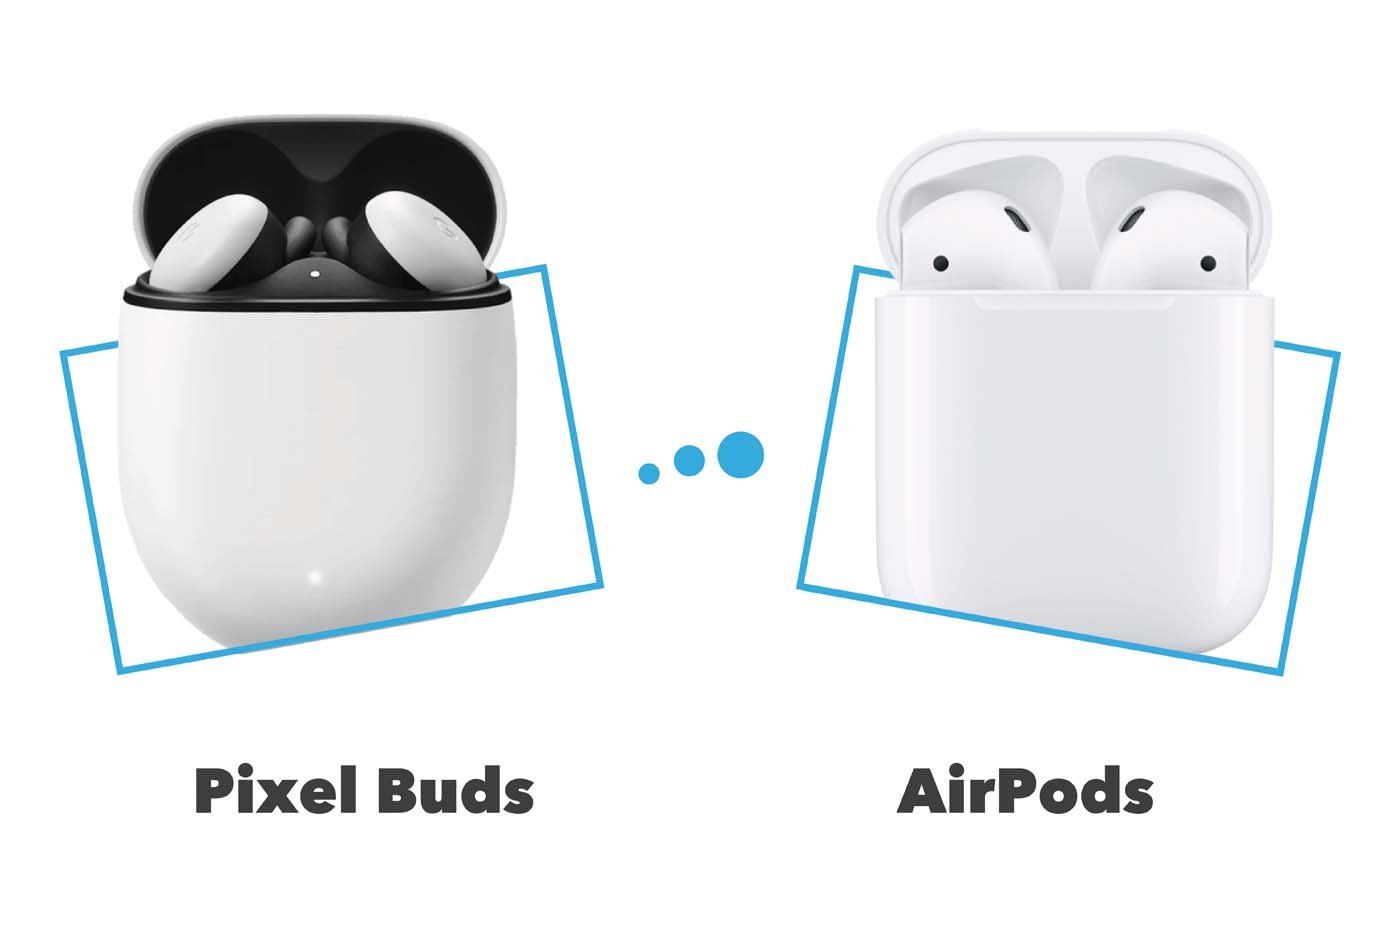 Comparatif Google Pixel Buds vs AirPods 2